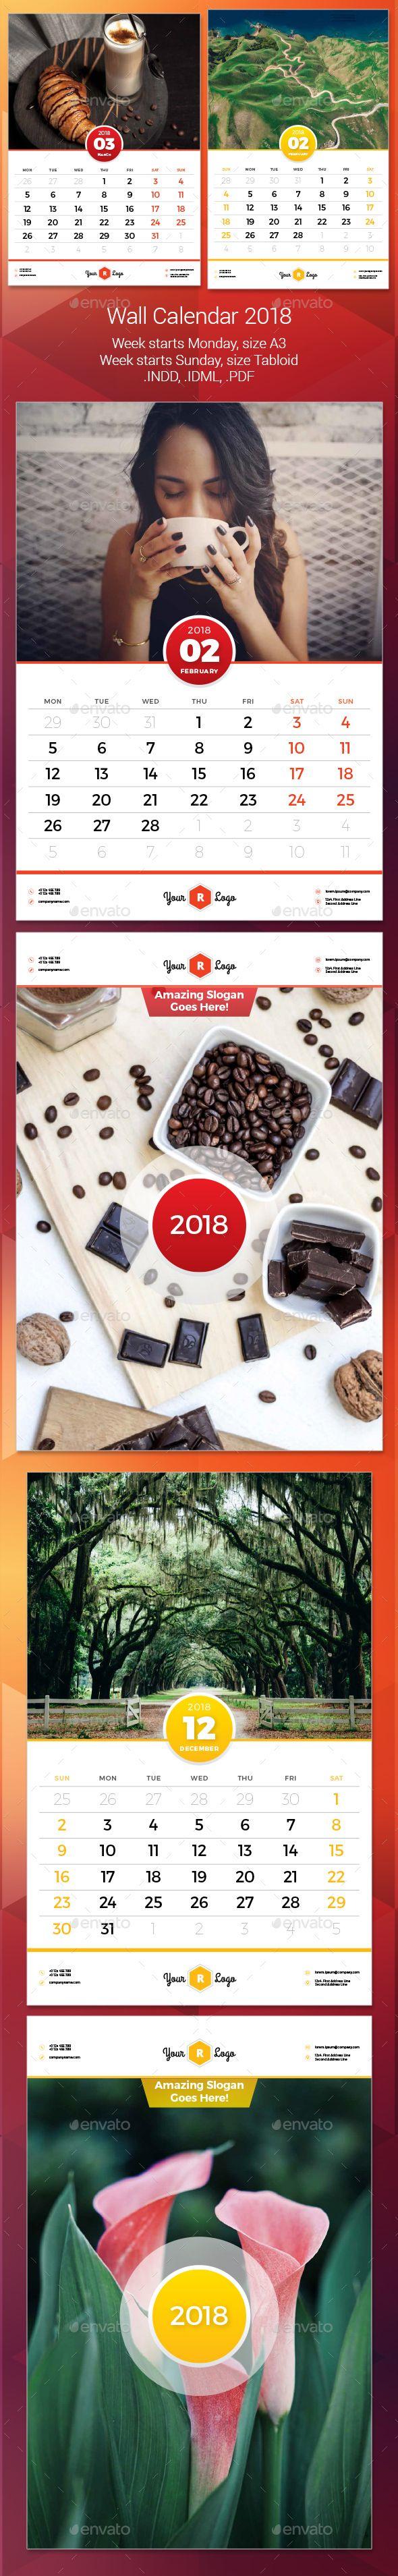 #simple #Wall #Calendar #template #2018 - #Calendars #Stationery #design. download here: https://graphicriver.net/item/wall-calendar-2018/20227418?ref=yinkira